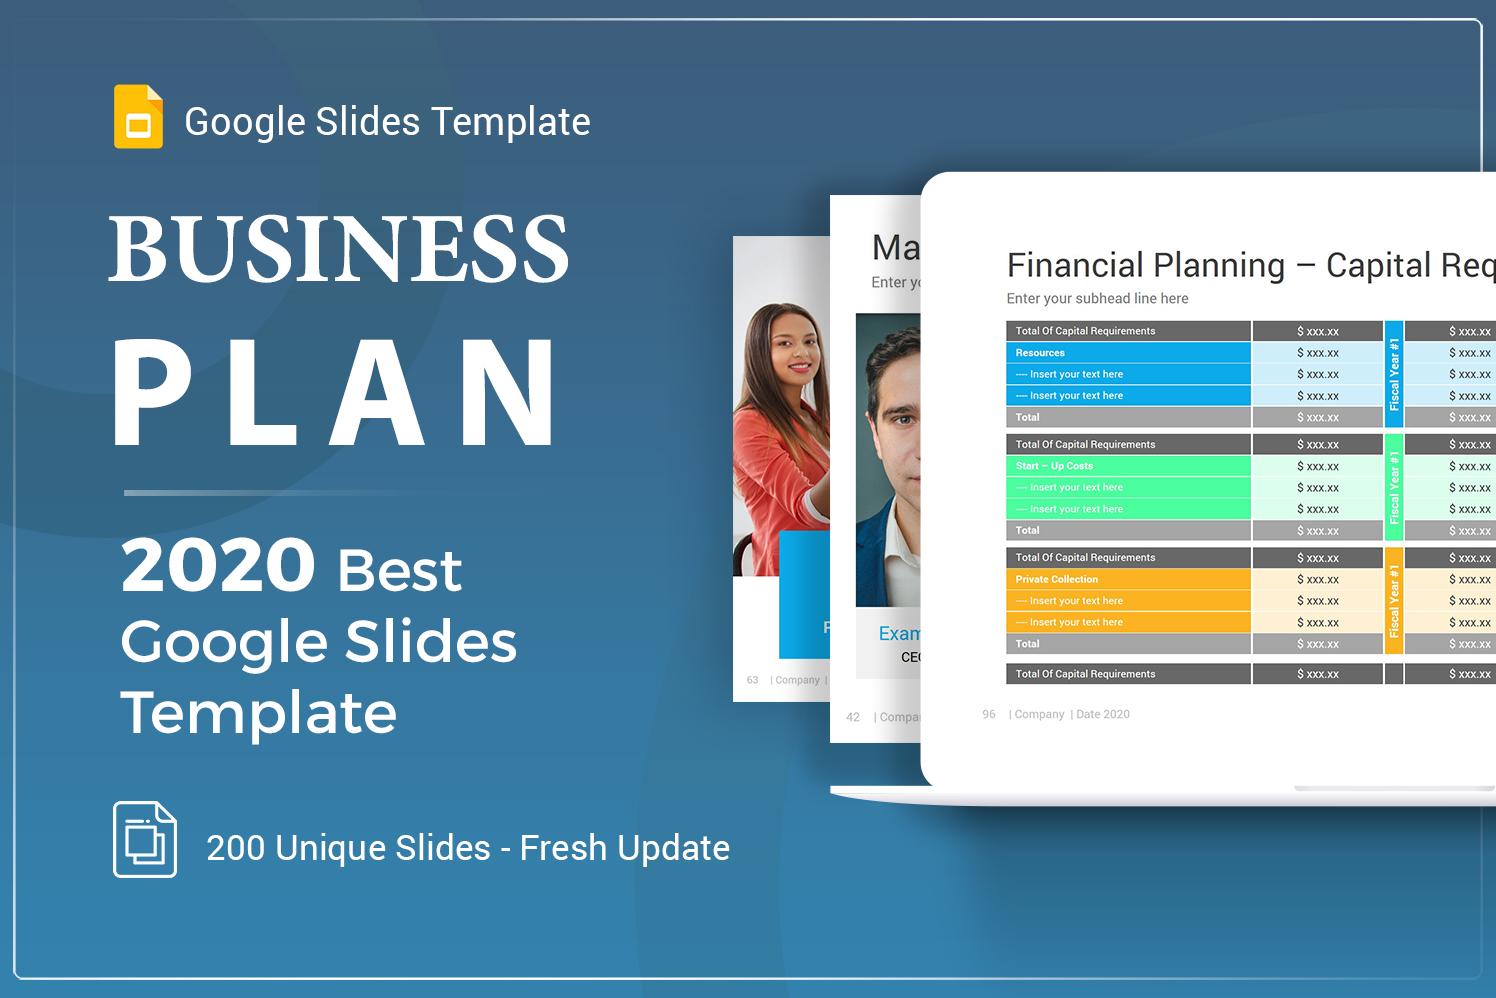 Premium Business Plan Google Slides #103013